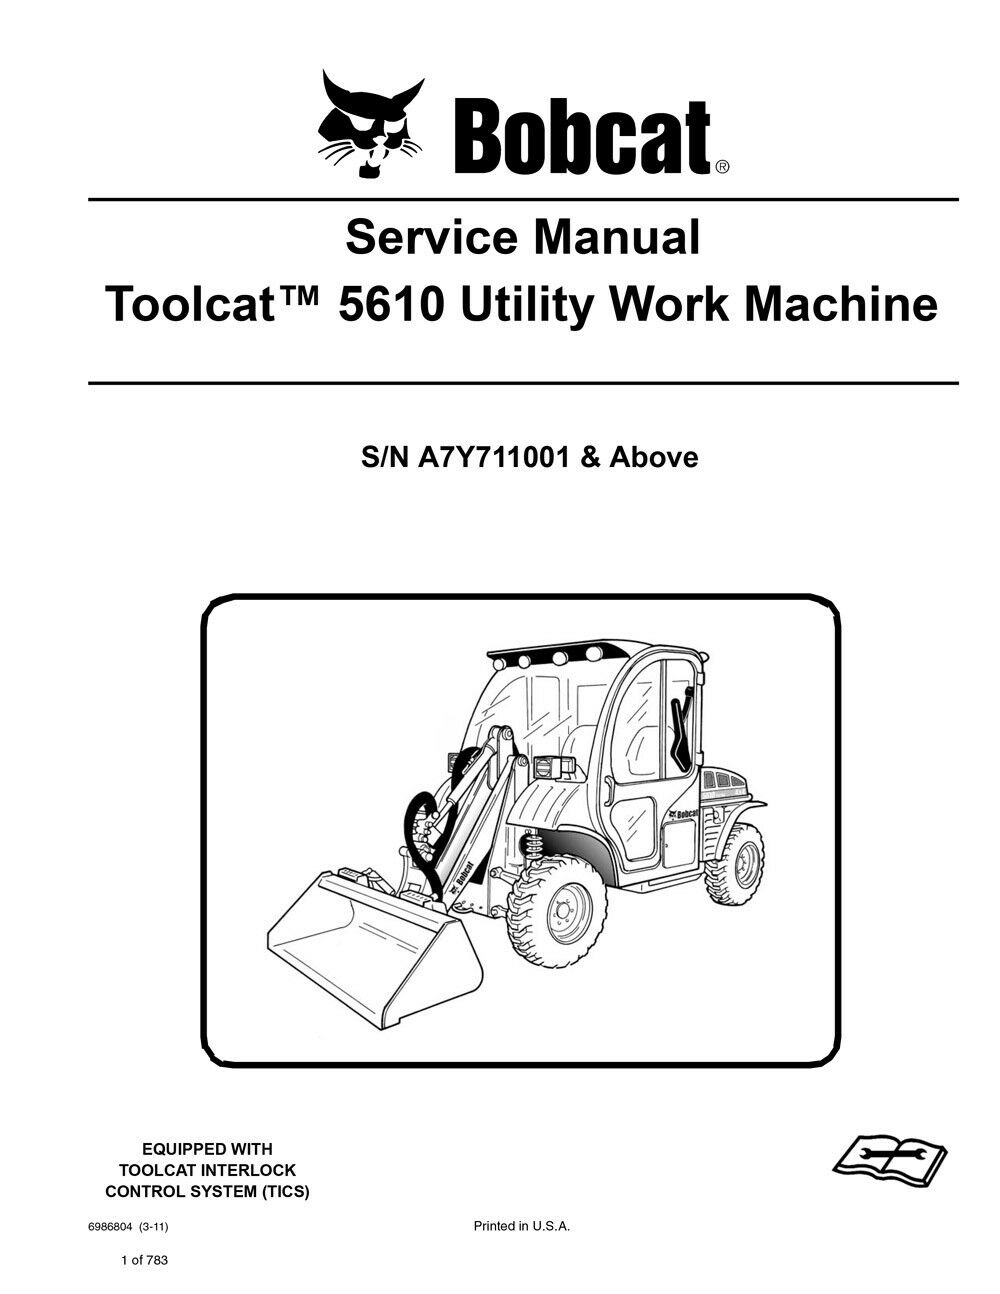 Bobcat 5610 Joystick Wire Diagram Electrical Wiring Ford Toolcat Explore Schematic U2022 S250 Equipment Diagrams